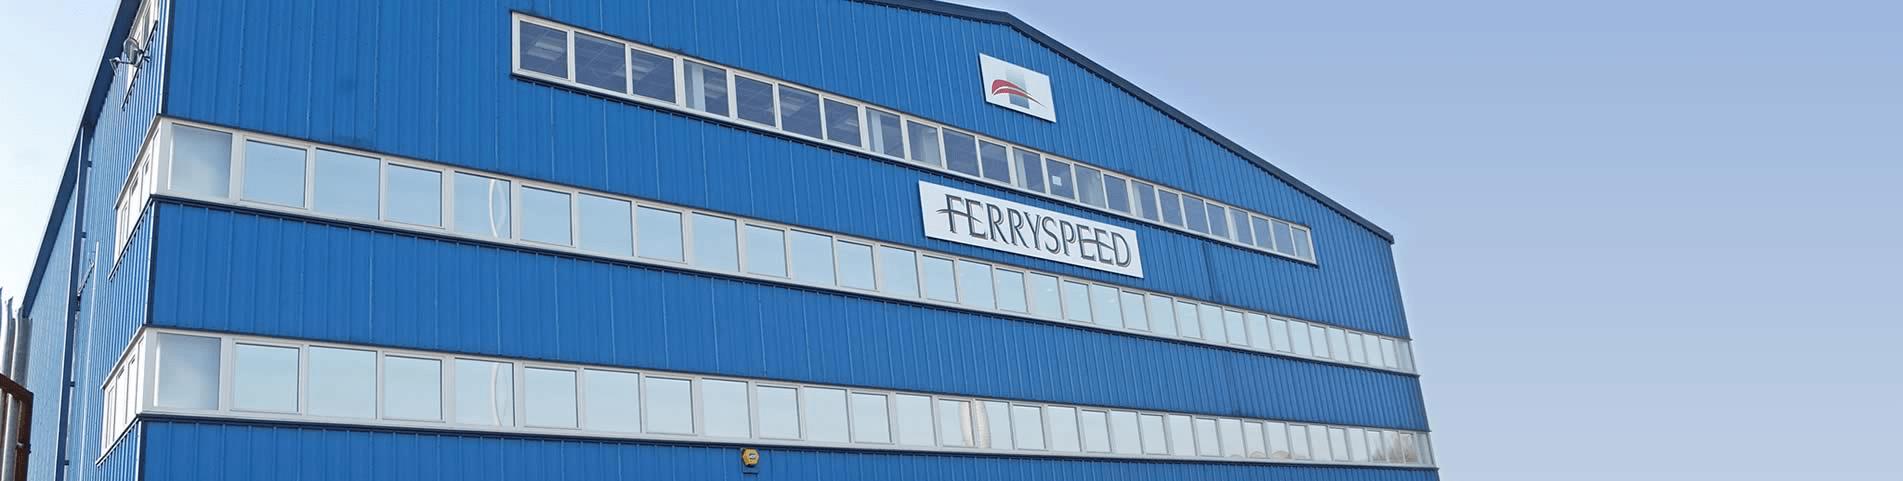 Ferryspeed building